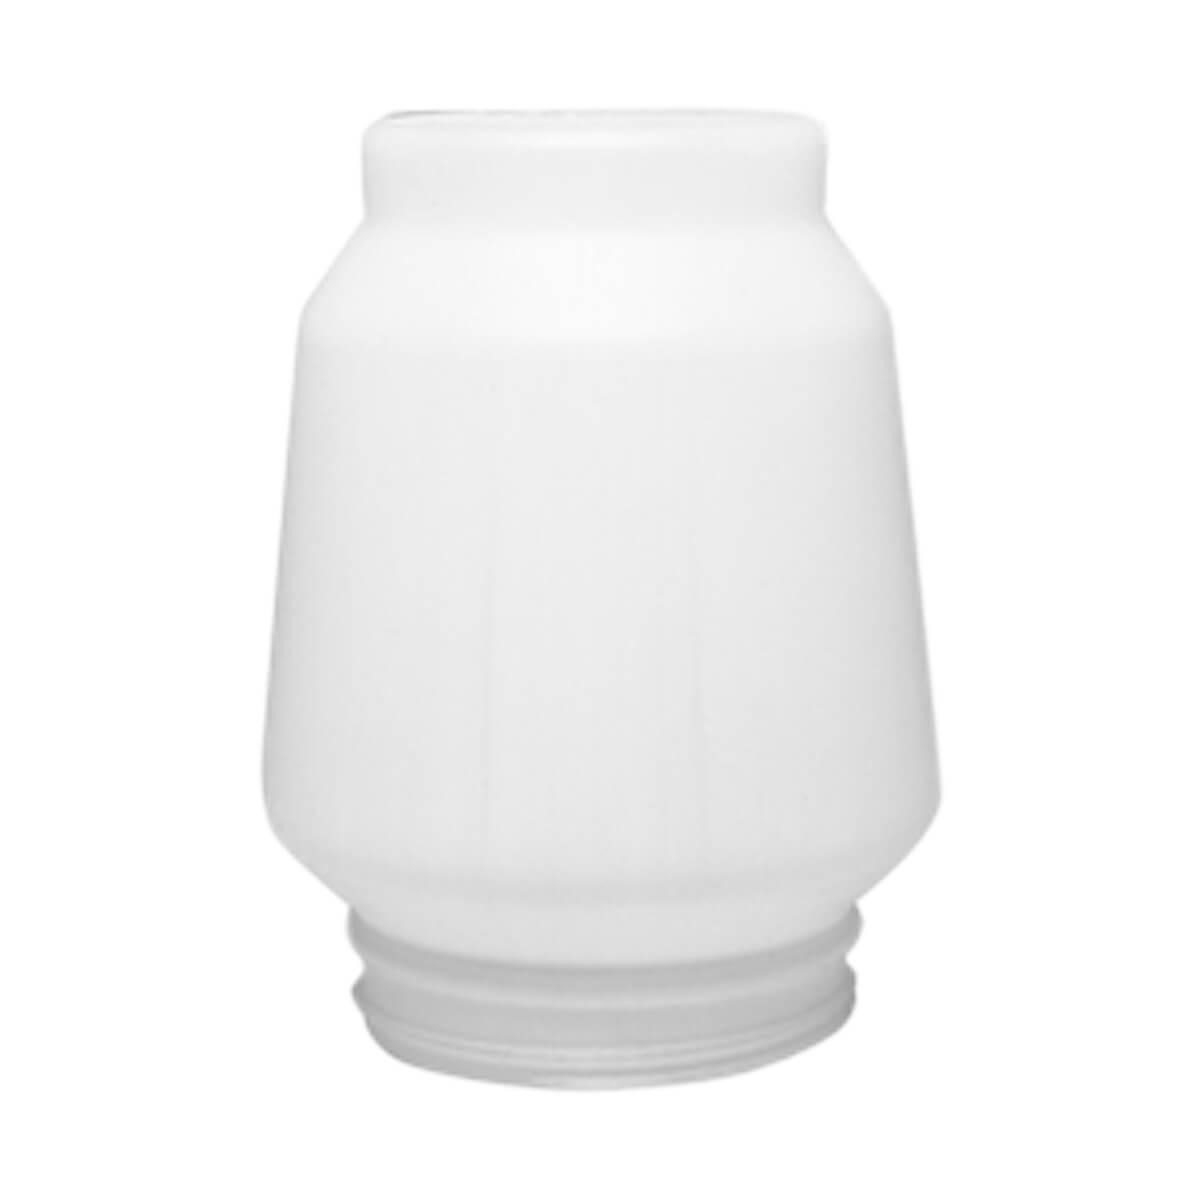 Clear Plastic Jar - 1 gal